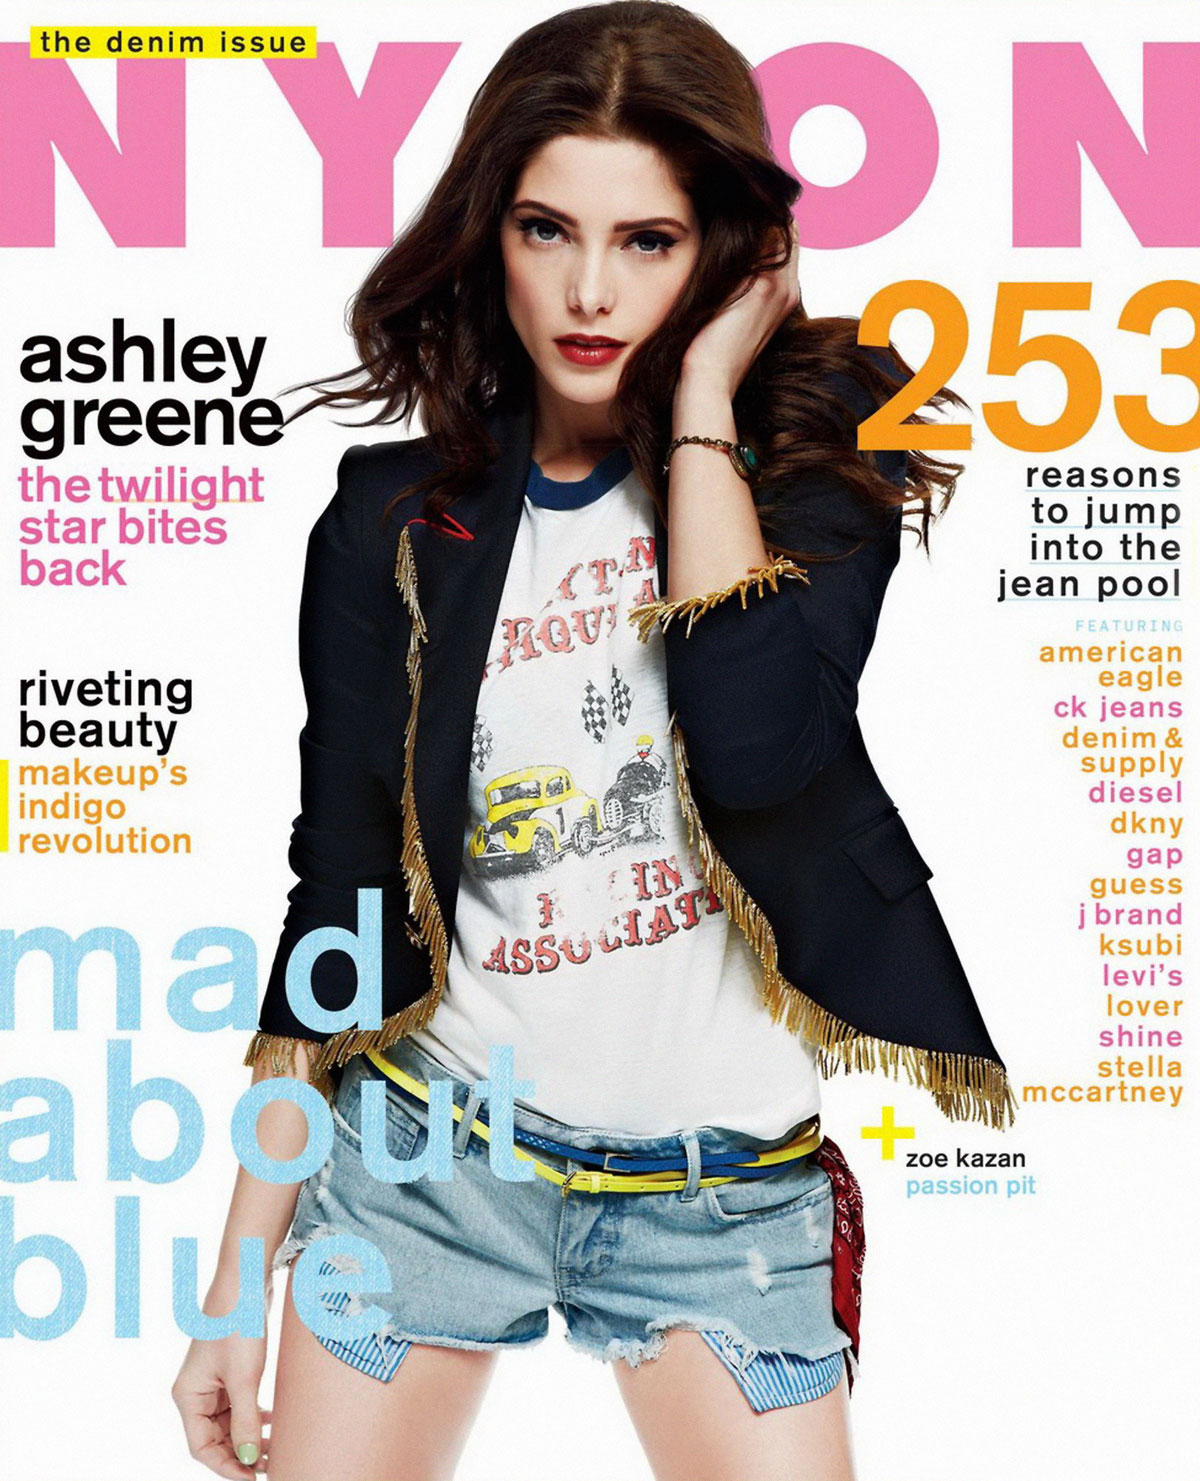 About Nylon Magazine 95